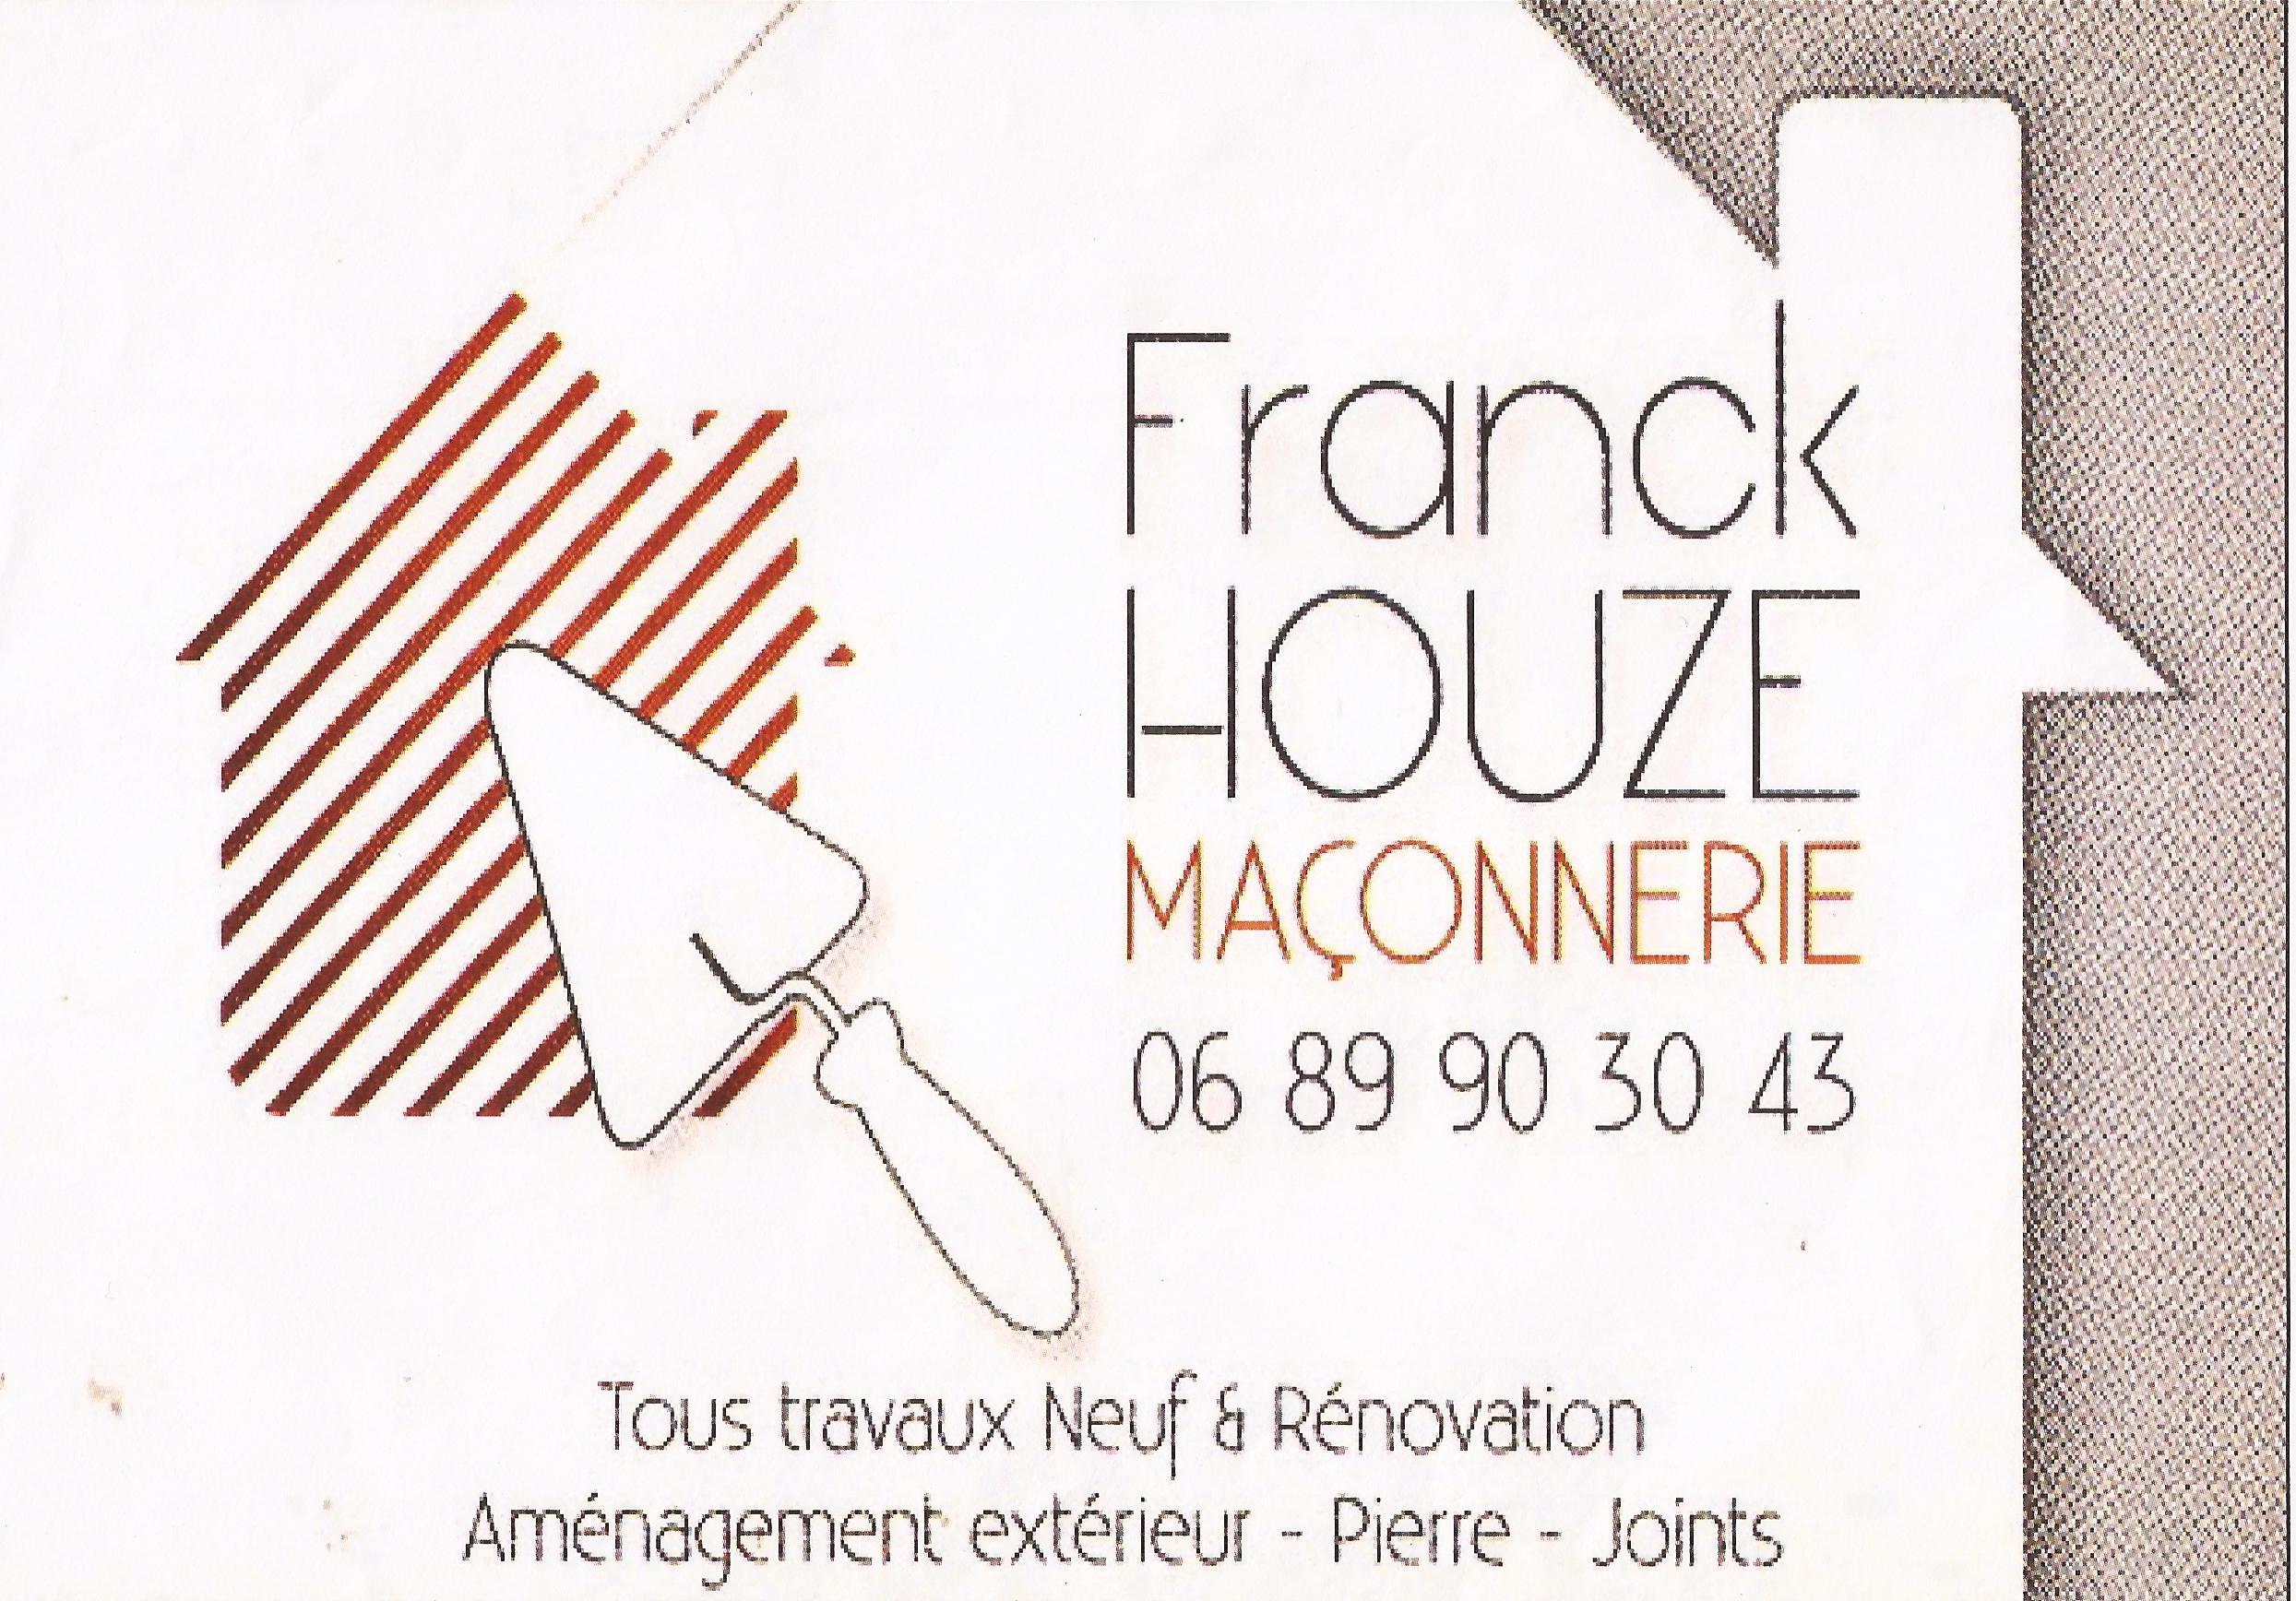 39 FRANCK HOUZE MACONNERIE - BOURSEUL